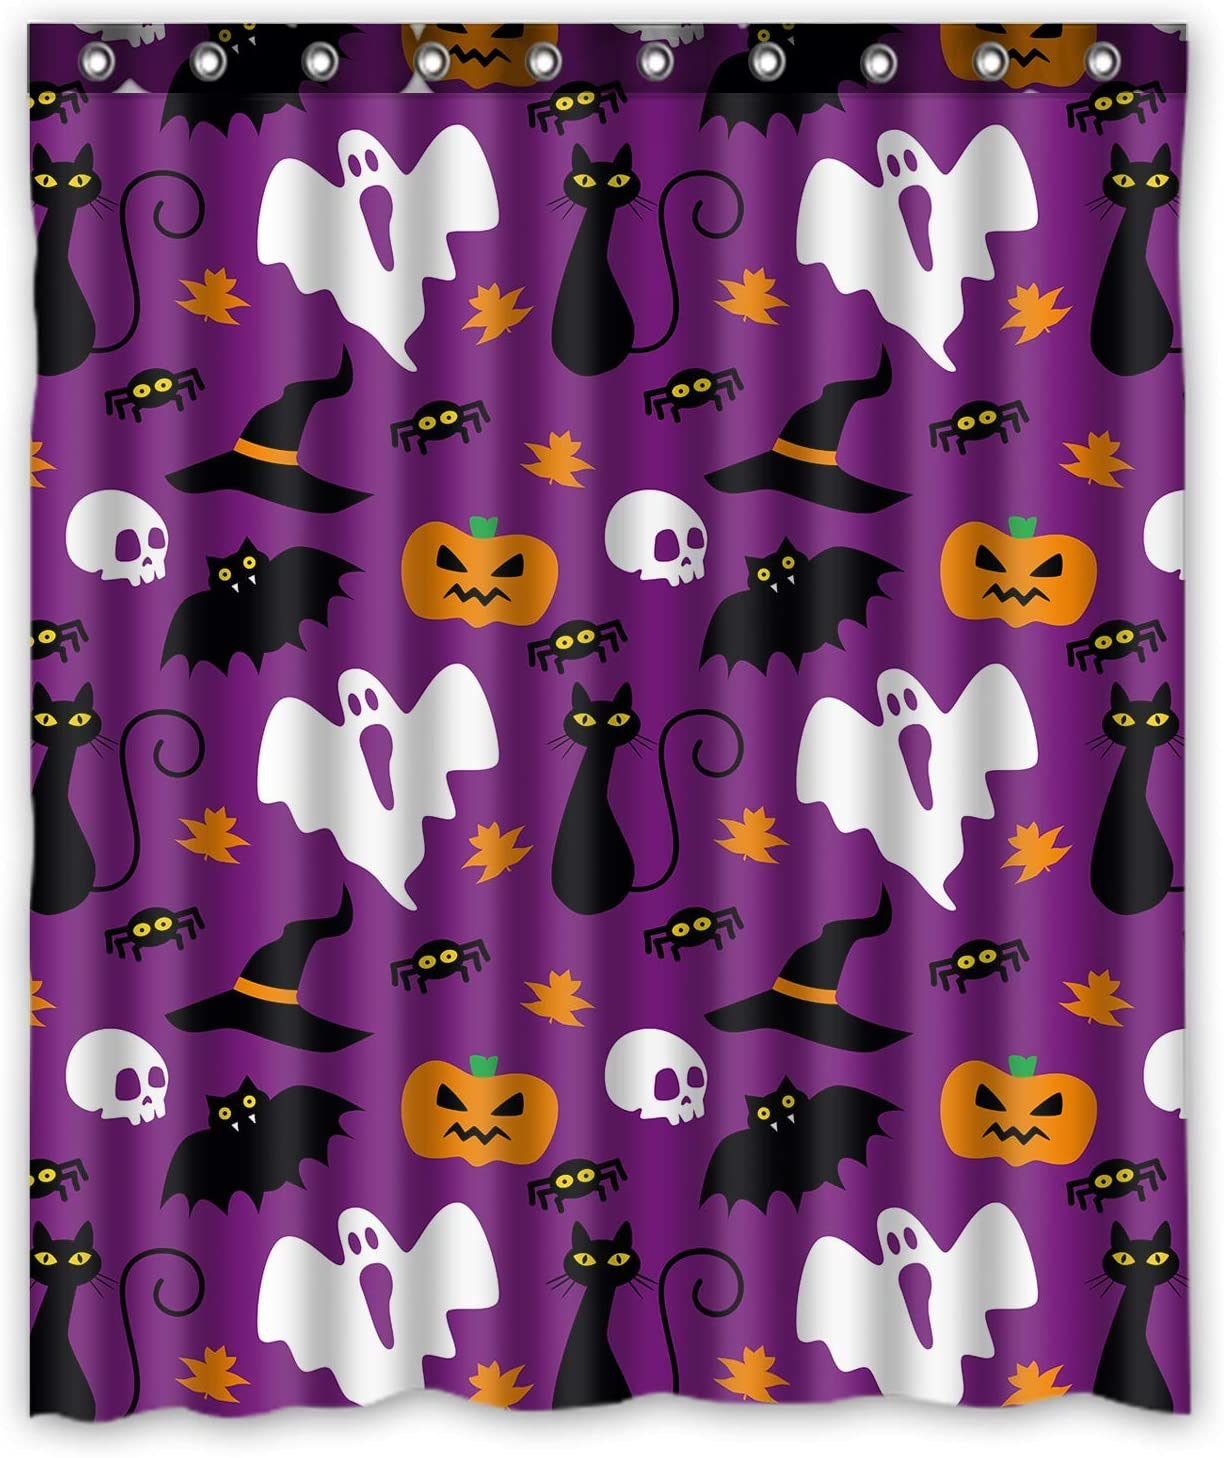 Magic Cat Pumpkin Shower Curtain Set Waterproof Fabric Halloween Bathroom Hooks